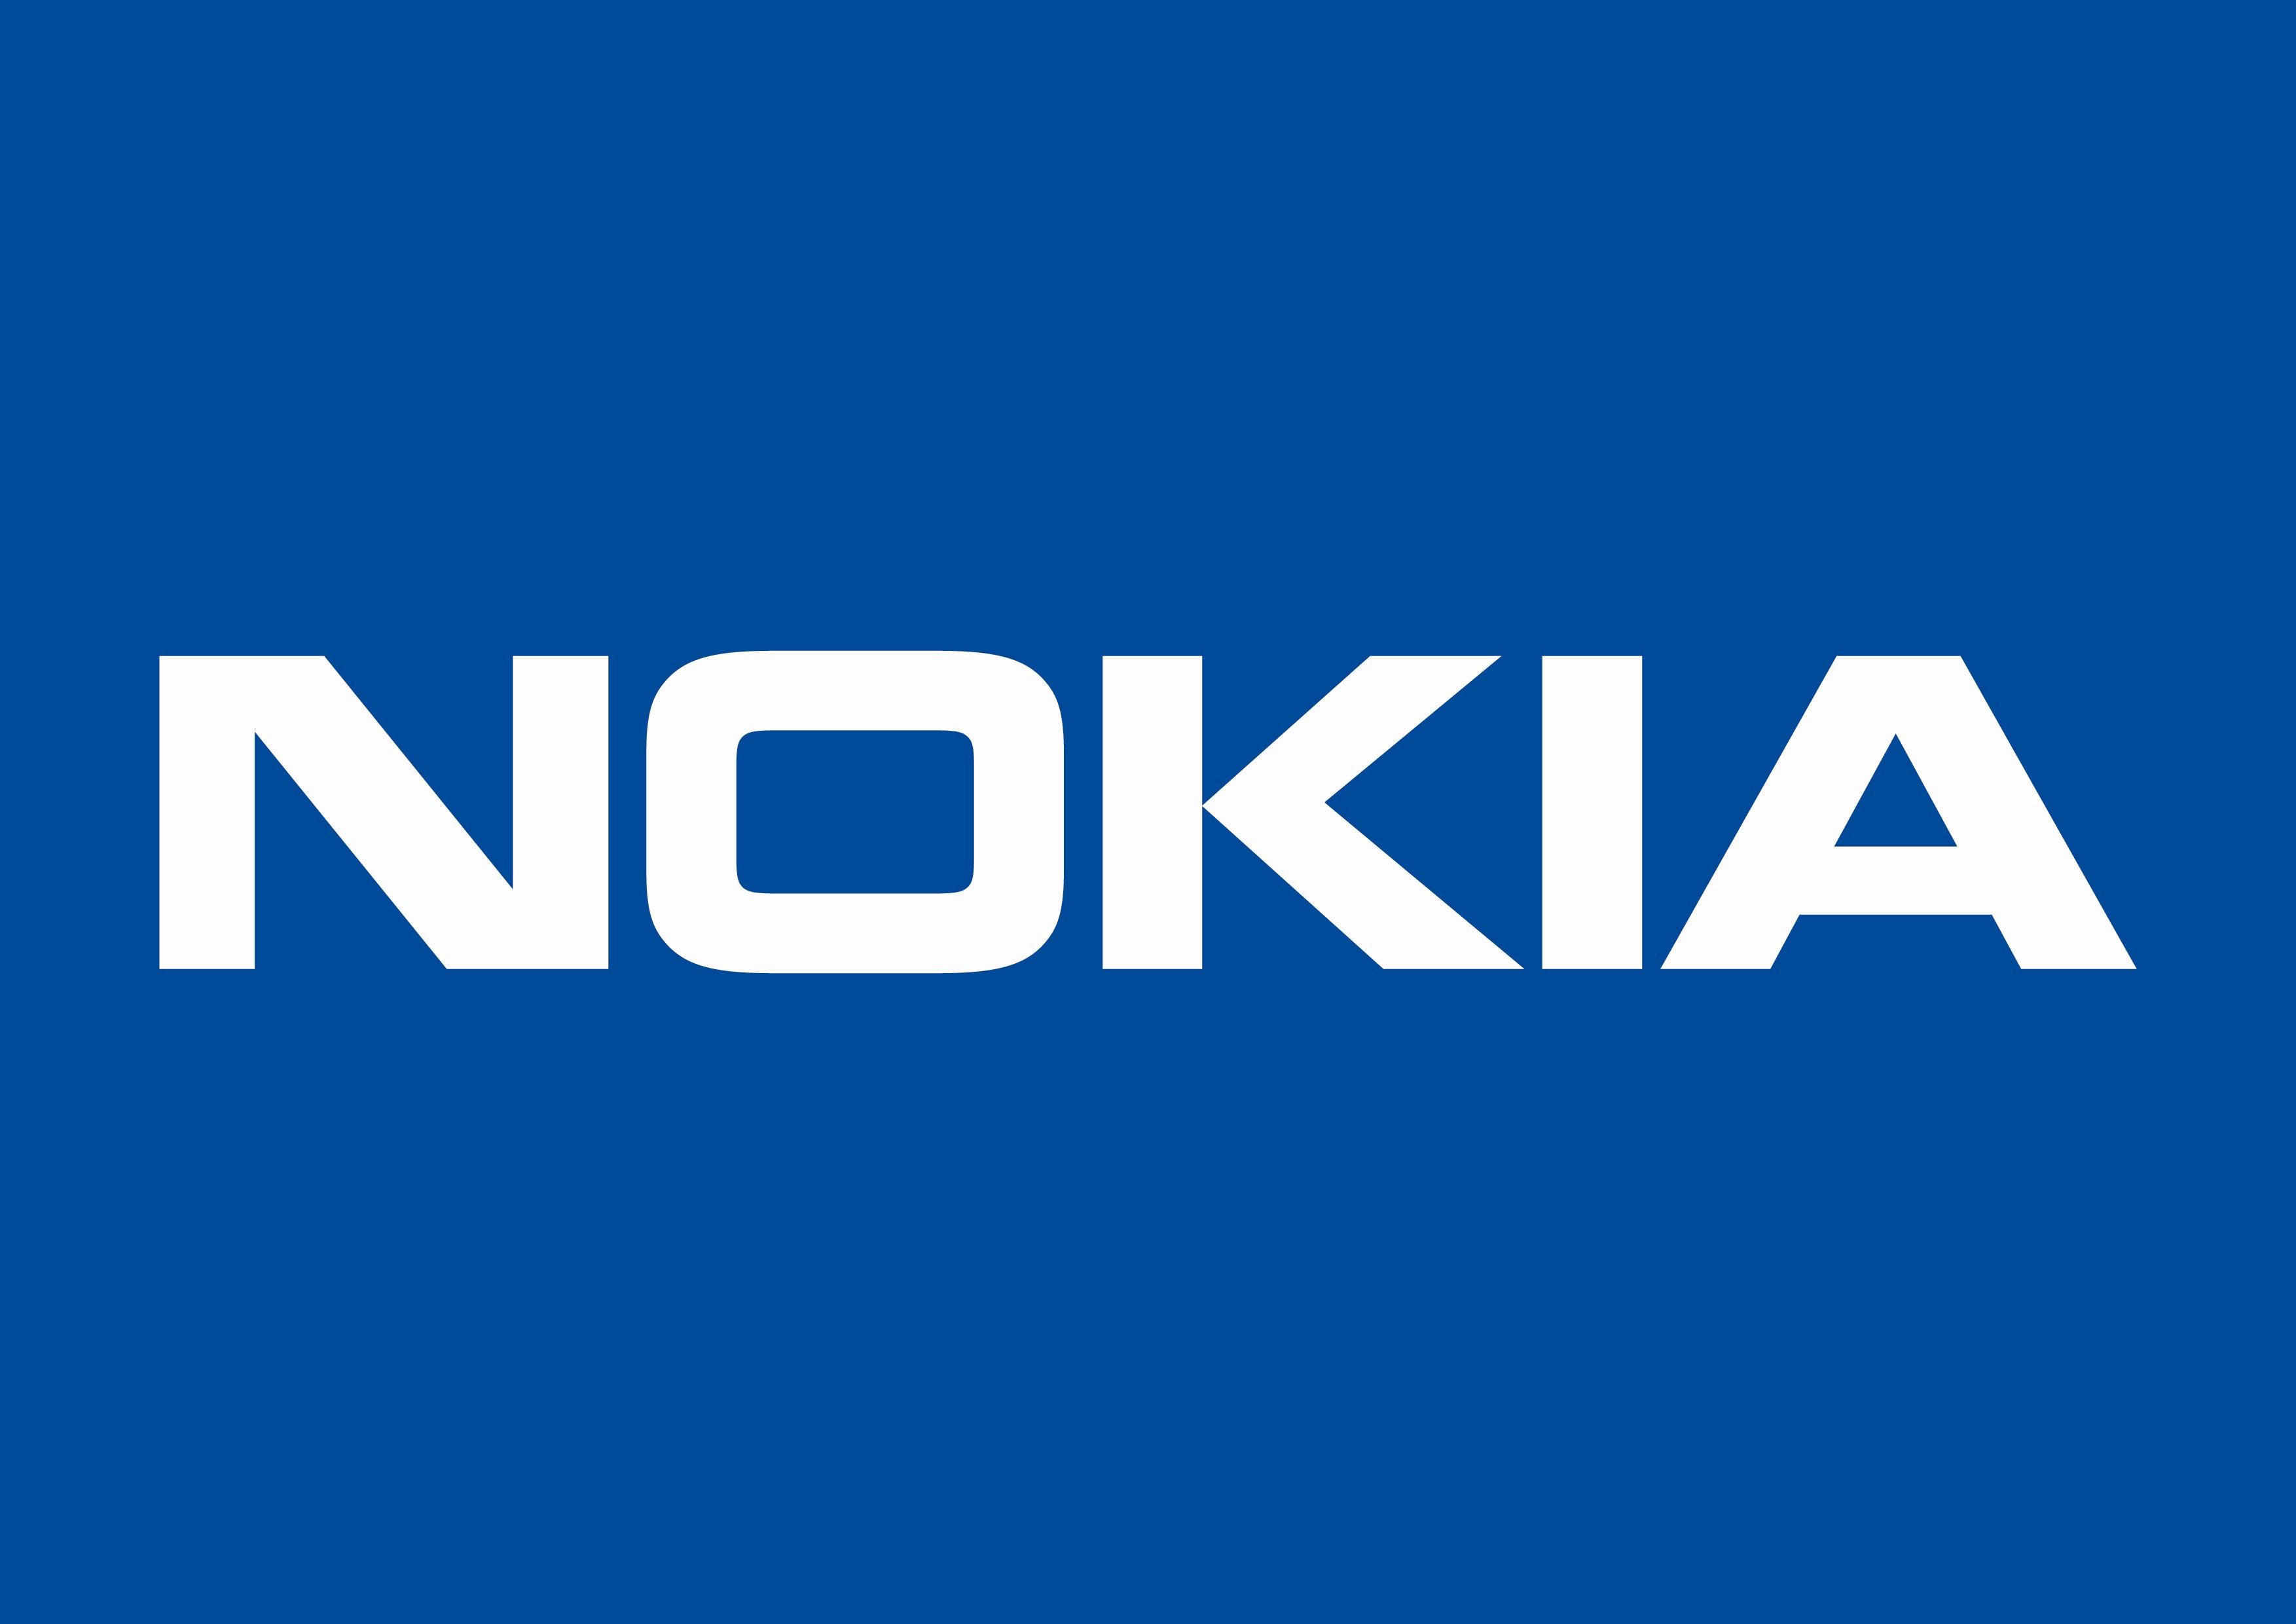 Service Nokia